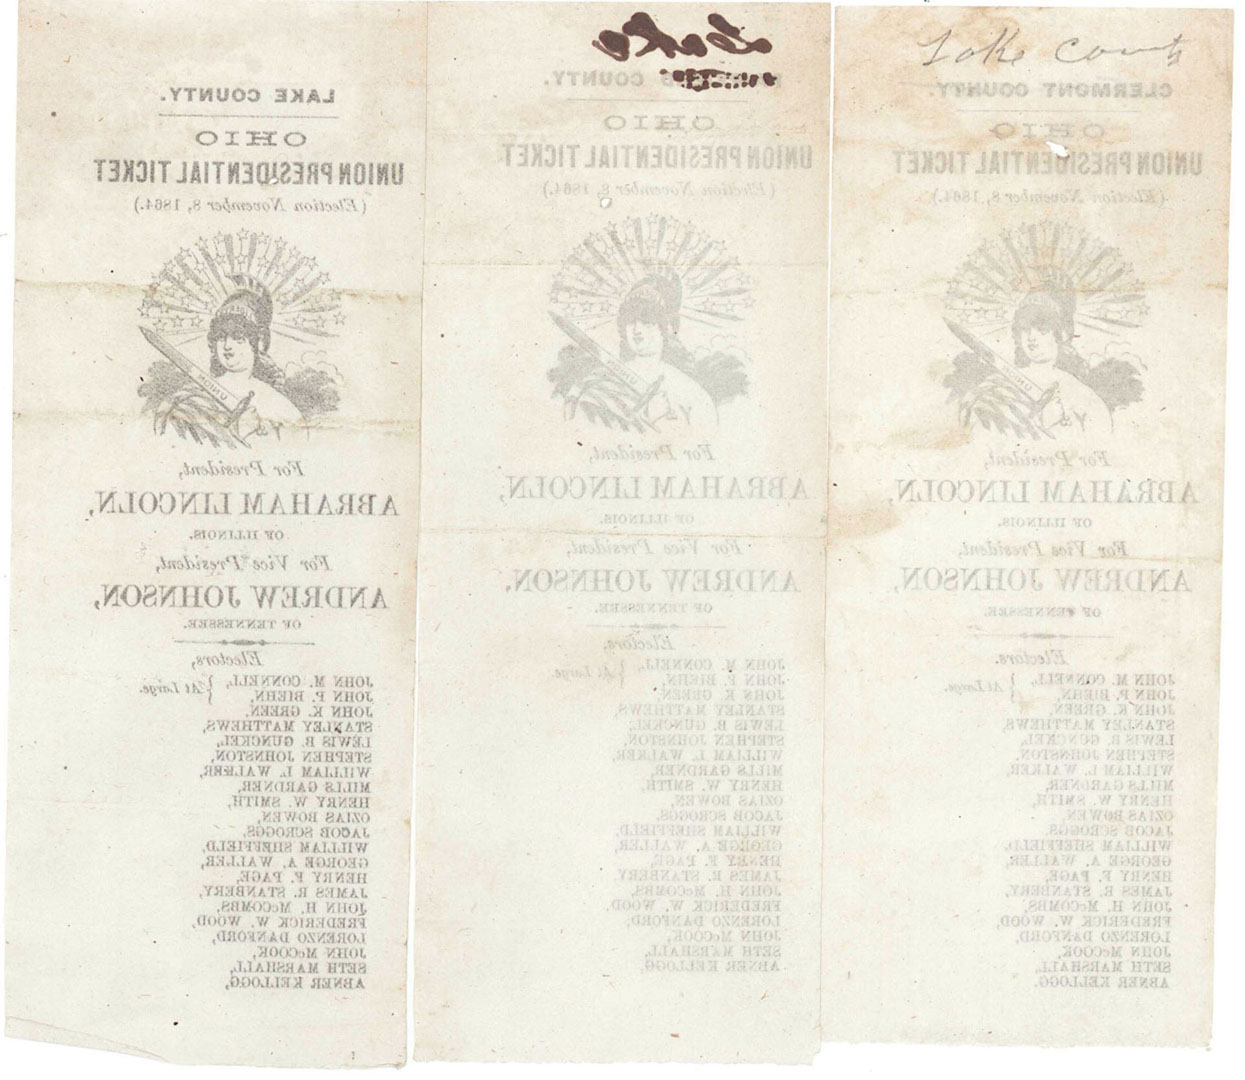 Lot 2872294: Three 1864 Election Ballots from Ohio